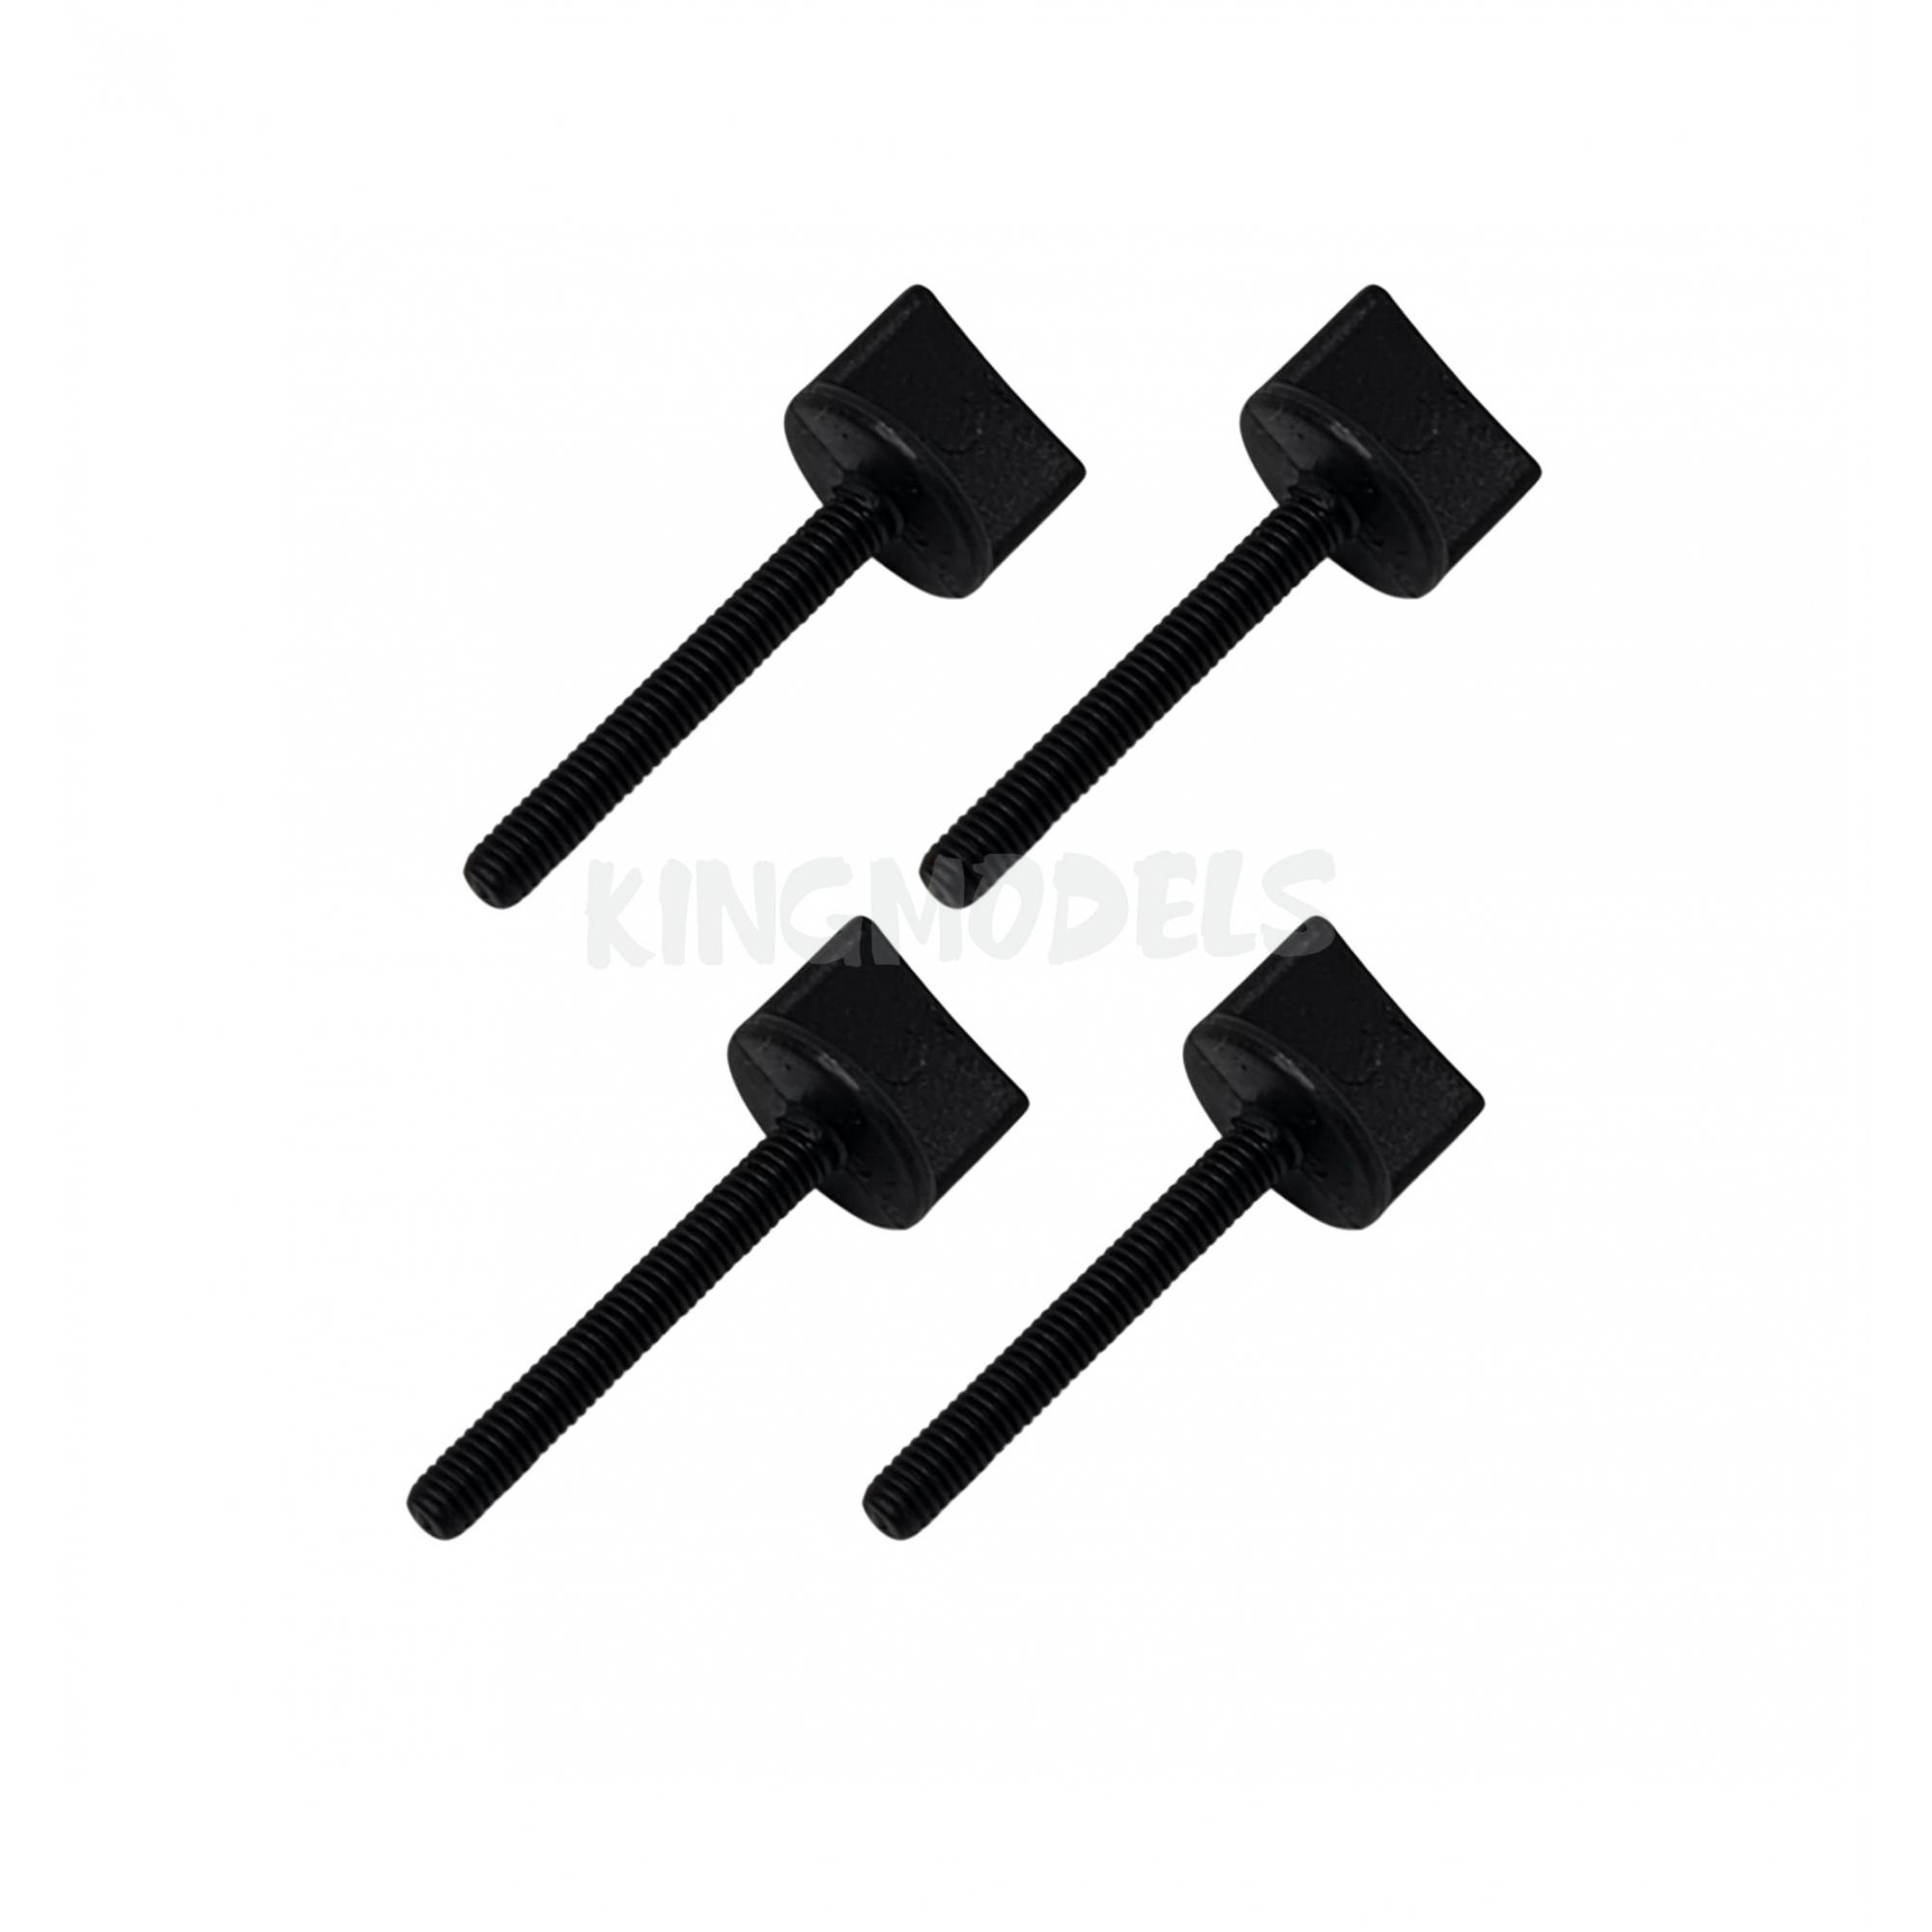 Parafuso Nylon Preto 35 X 4mm - Fixação Asa Aeros - 4pçs  - King Models